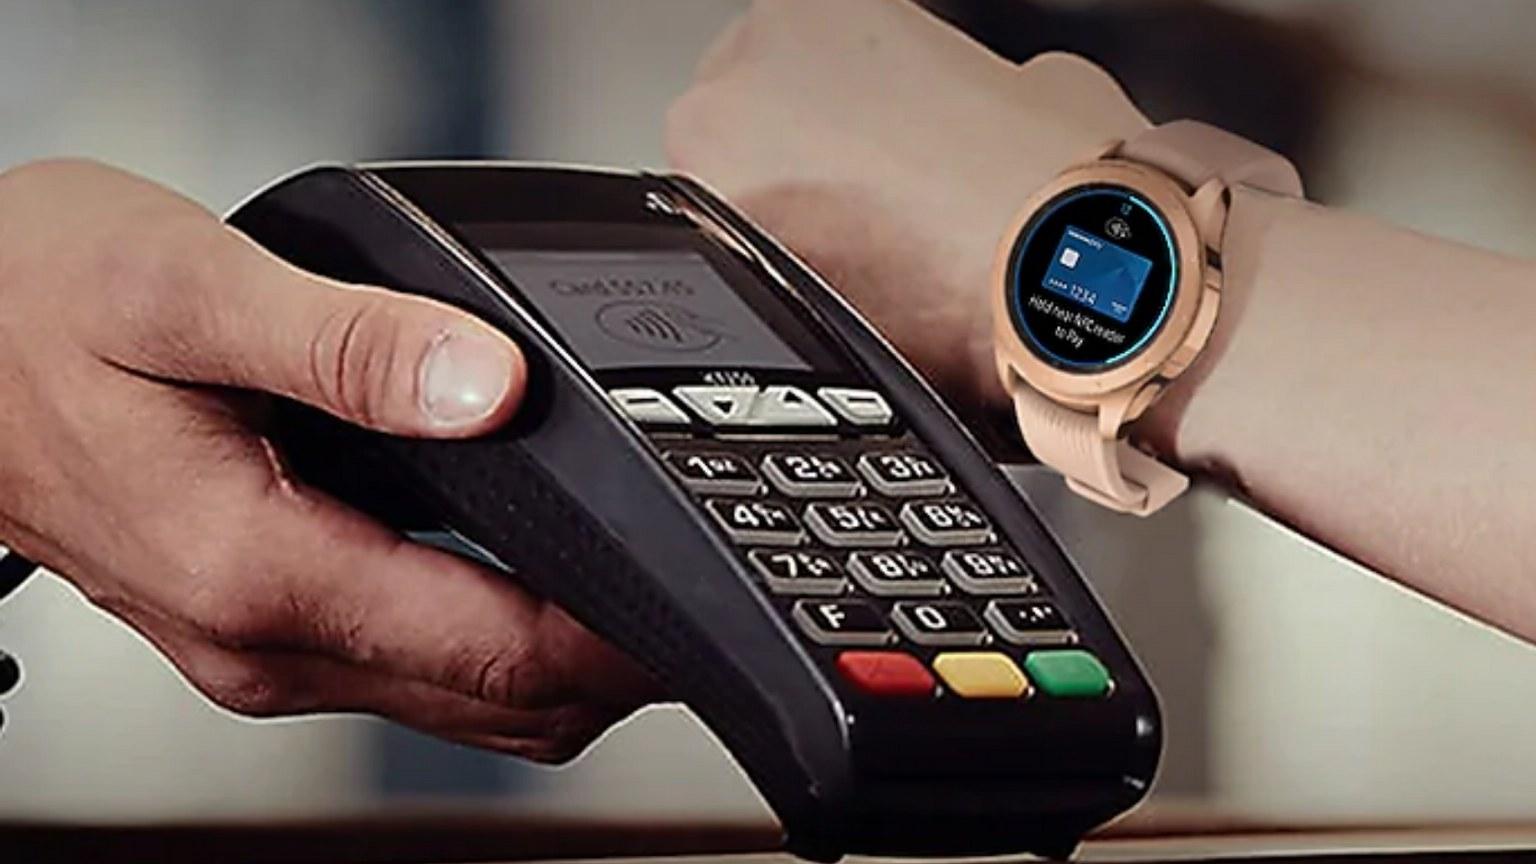 Samsung Galaxy Pay